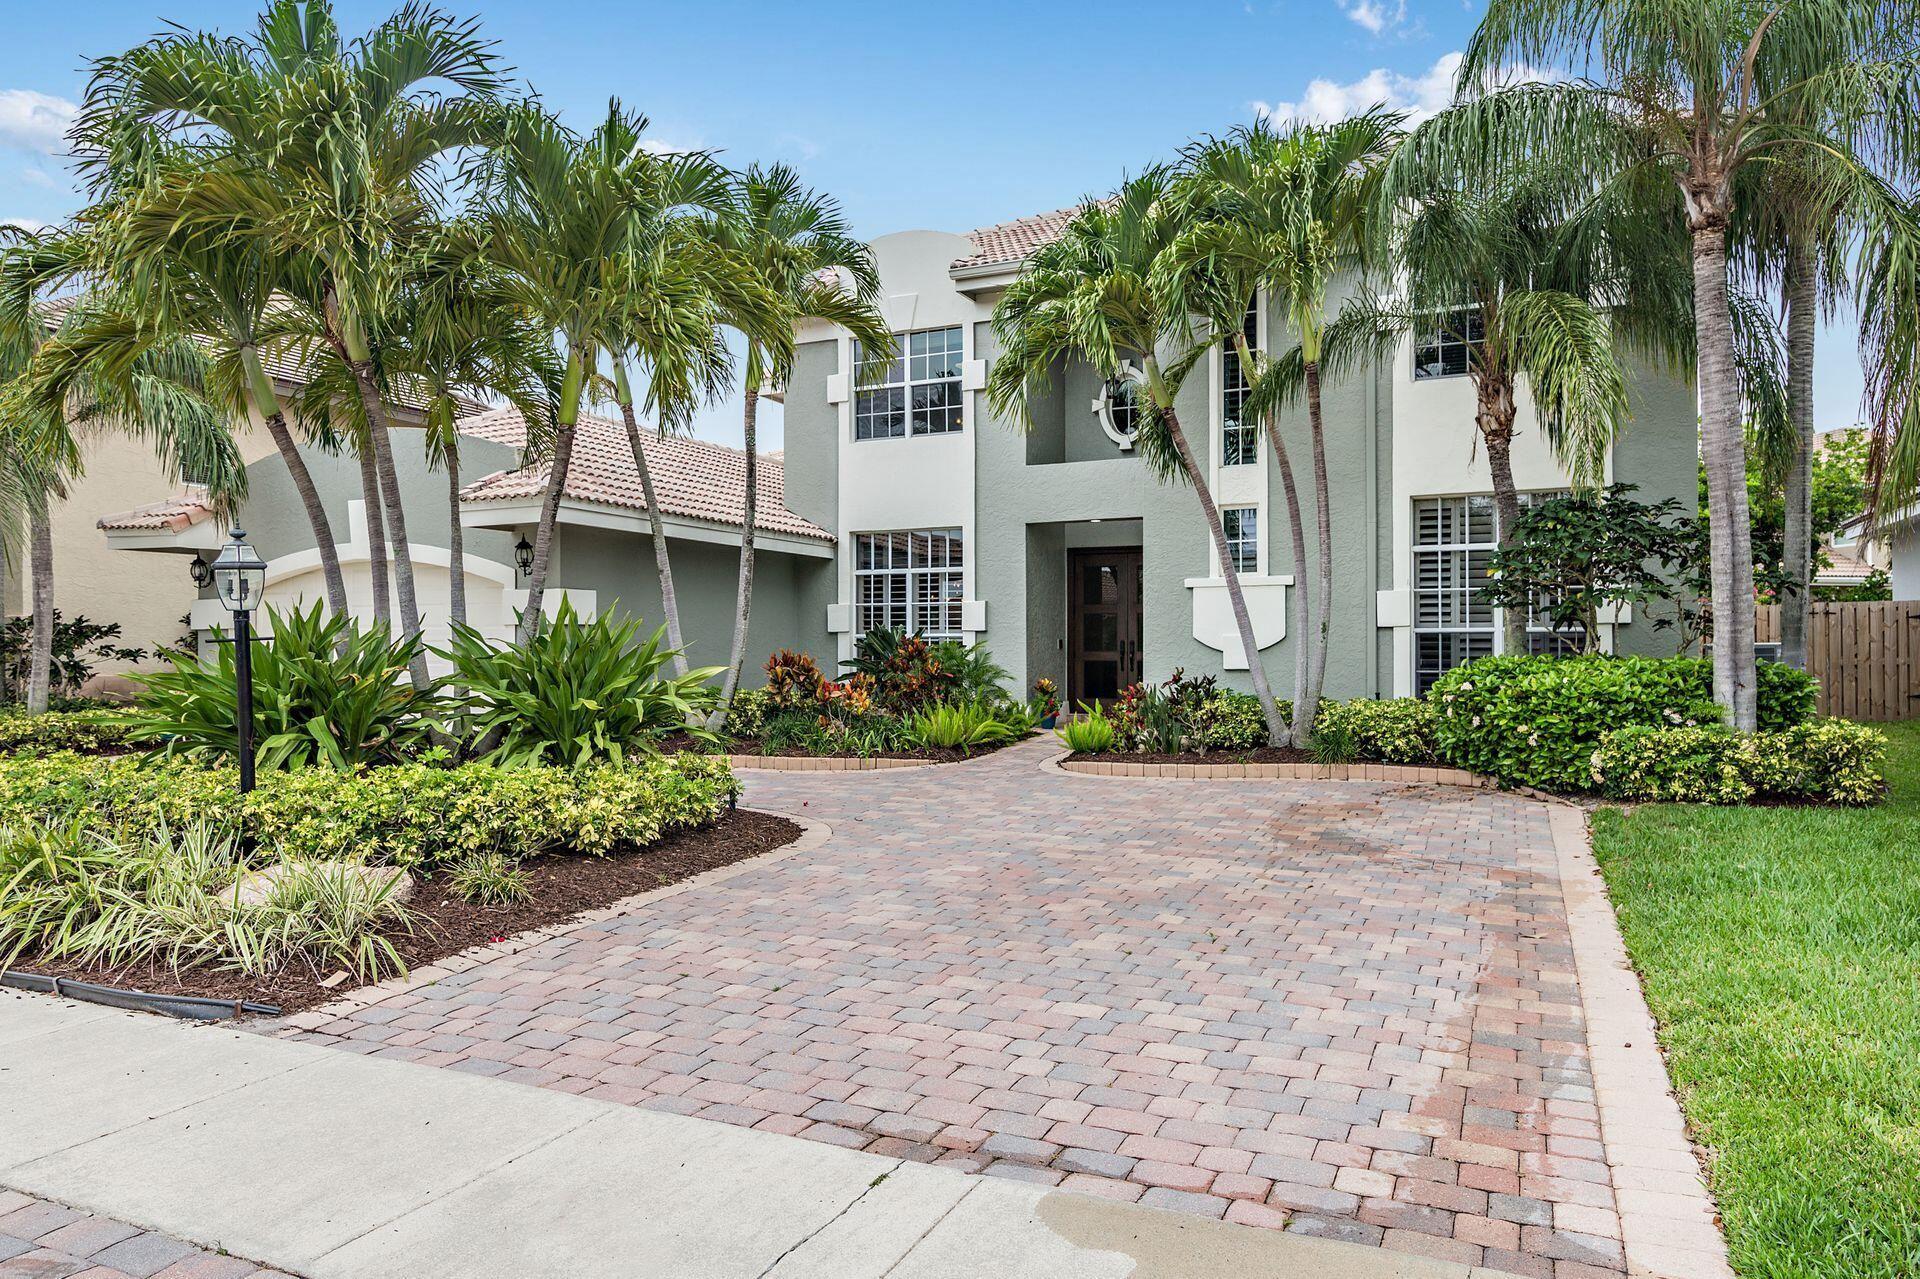 Photo of 13455 Bradfords Wharf, Palm Beach Gardens, FL 33410 (MLS # RX-10726234)